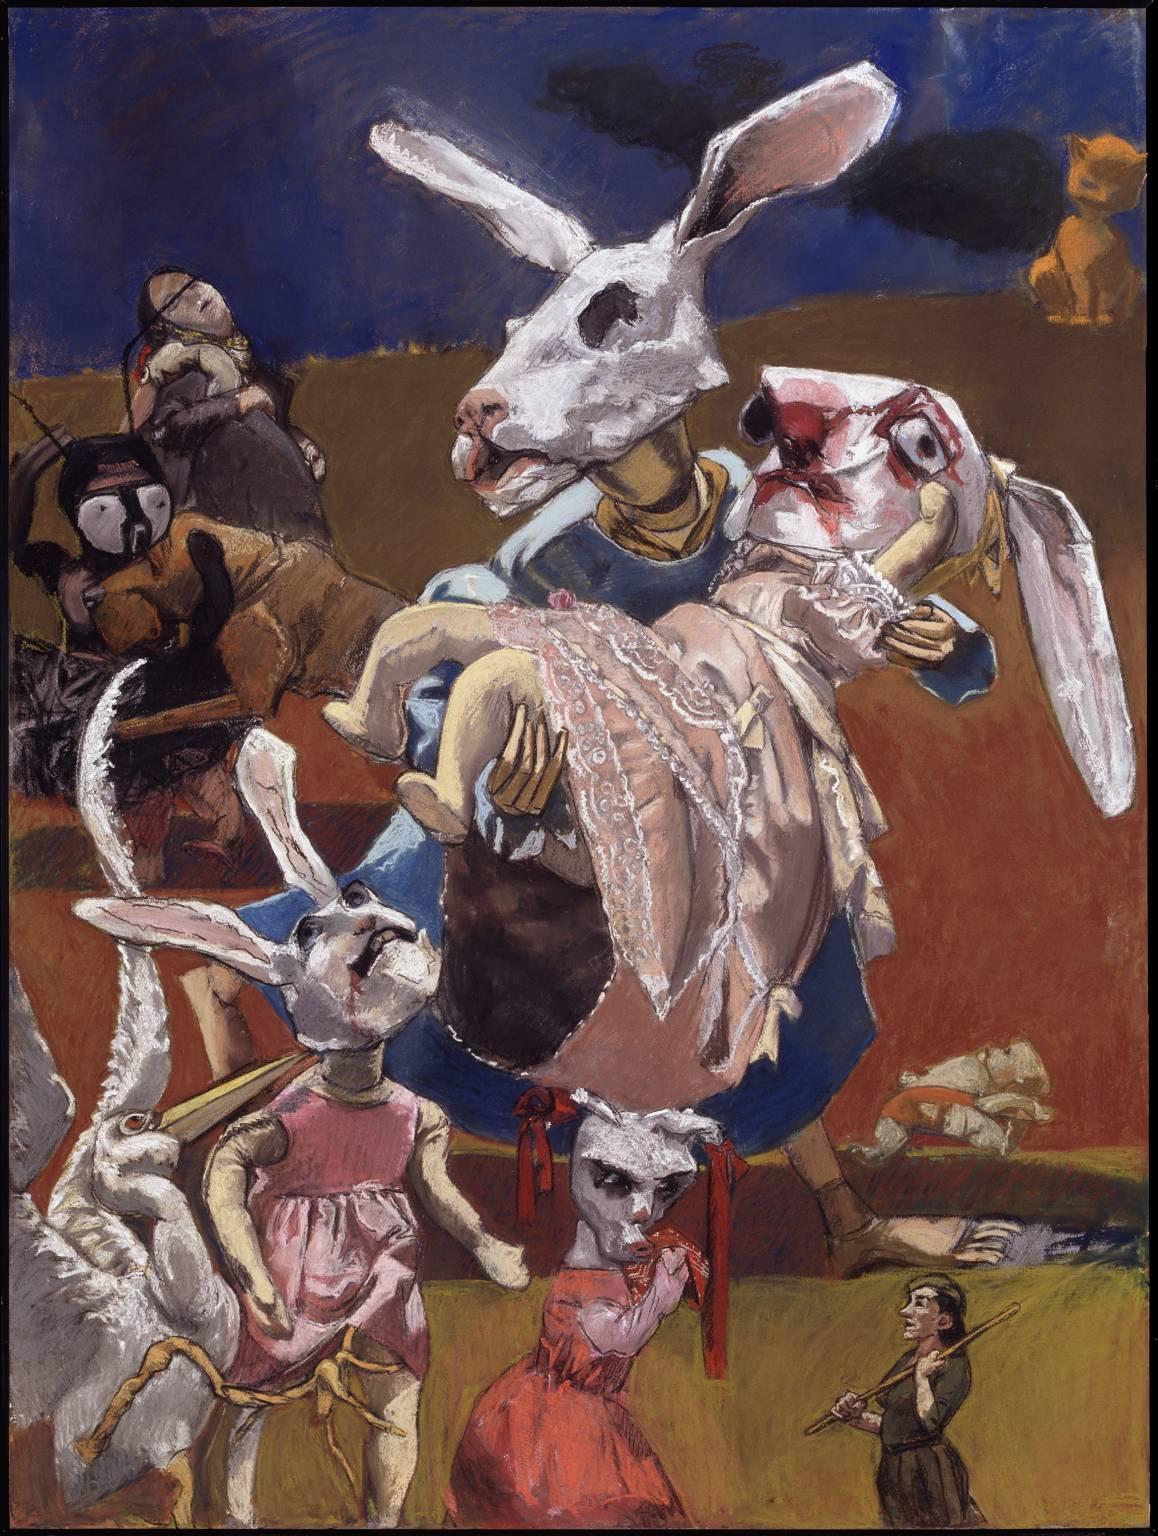 Paula Rego, War, 2003